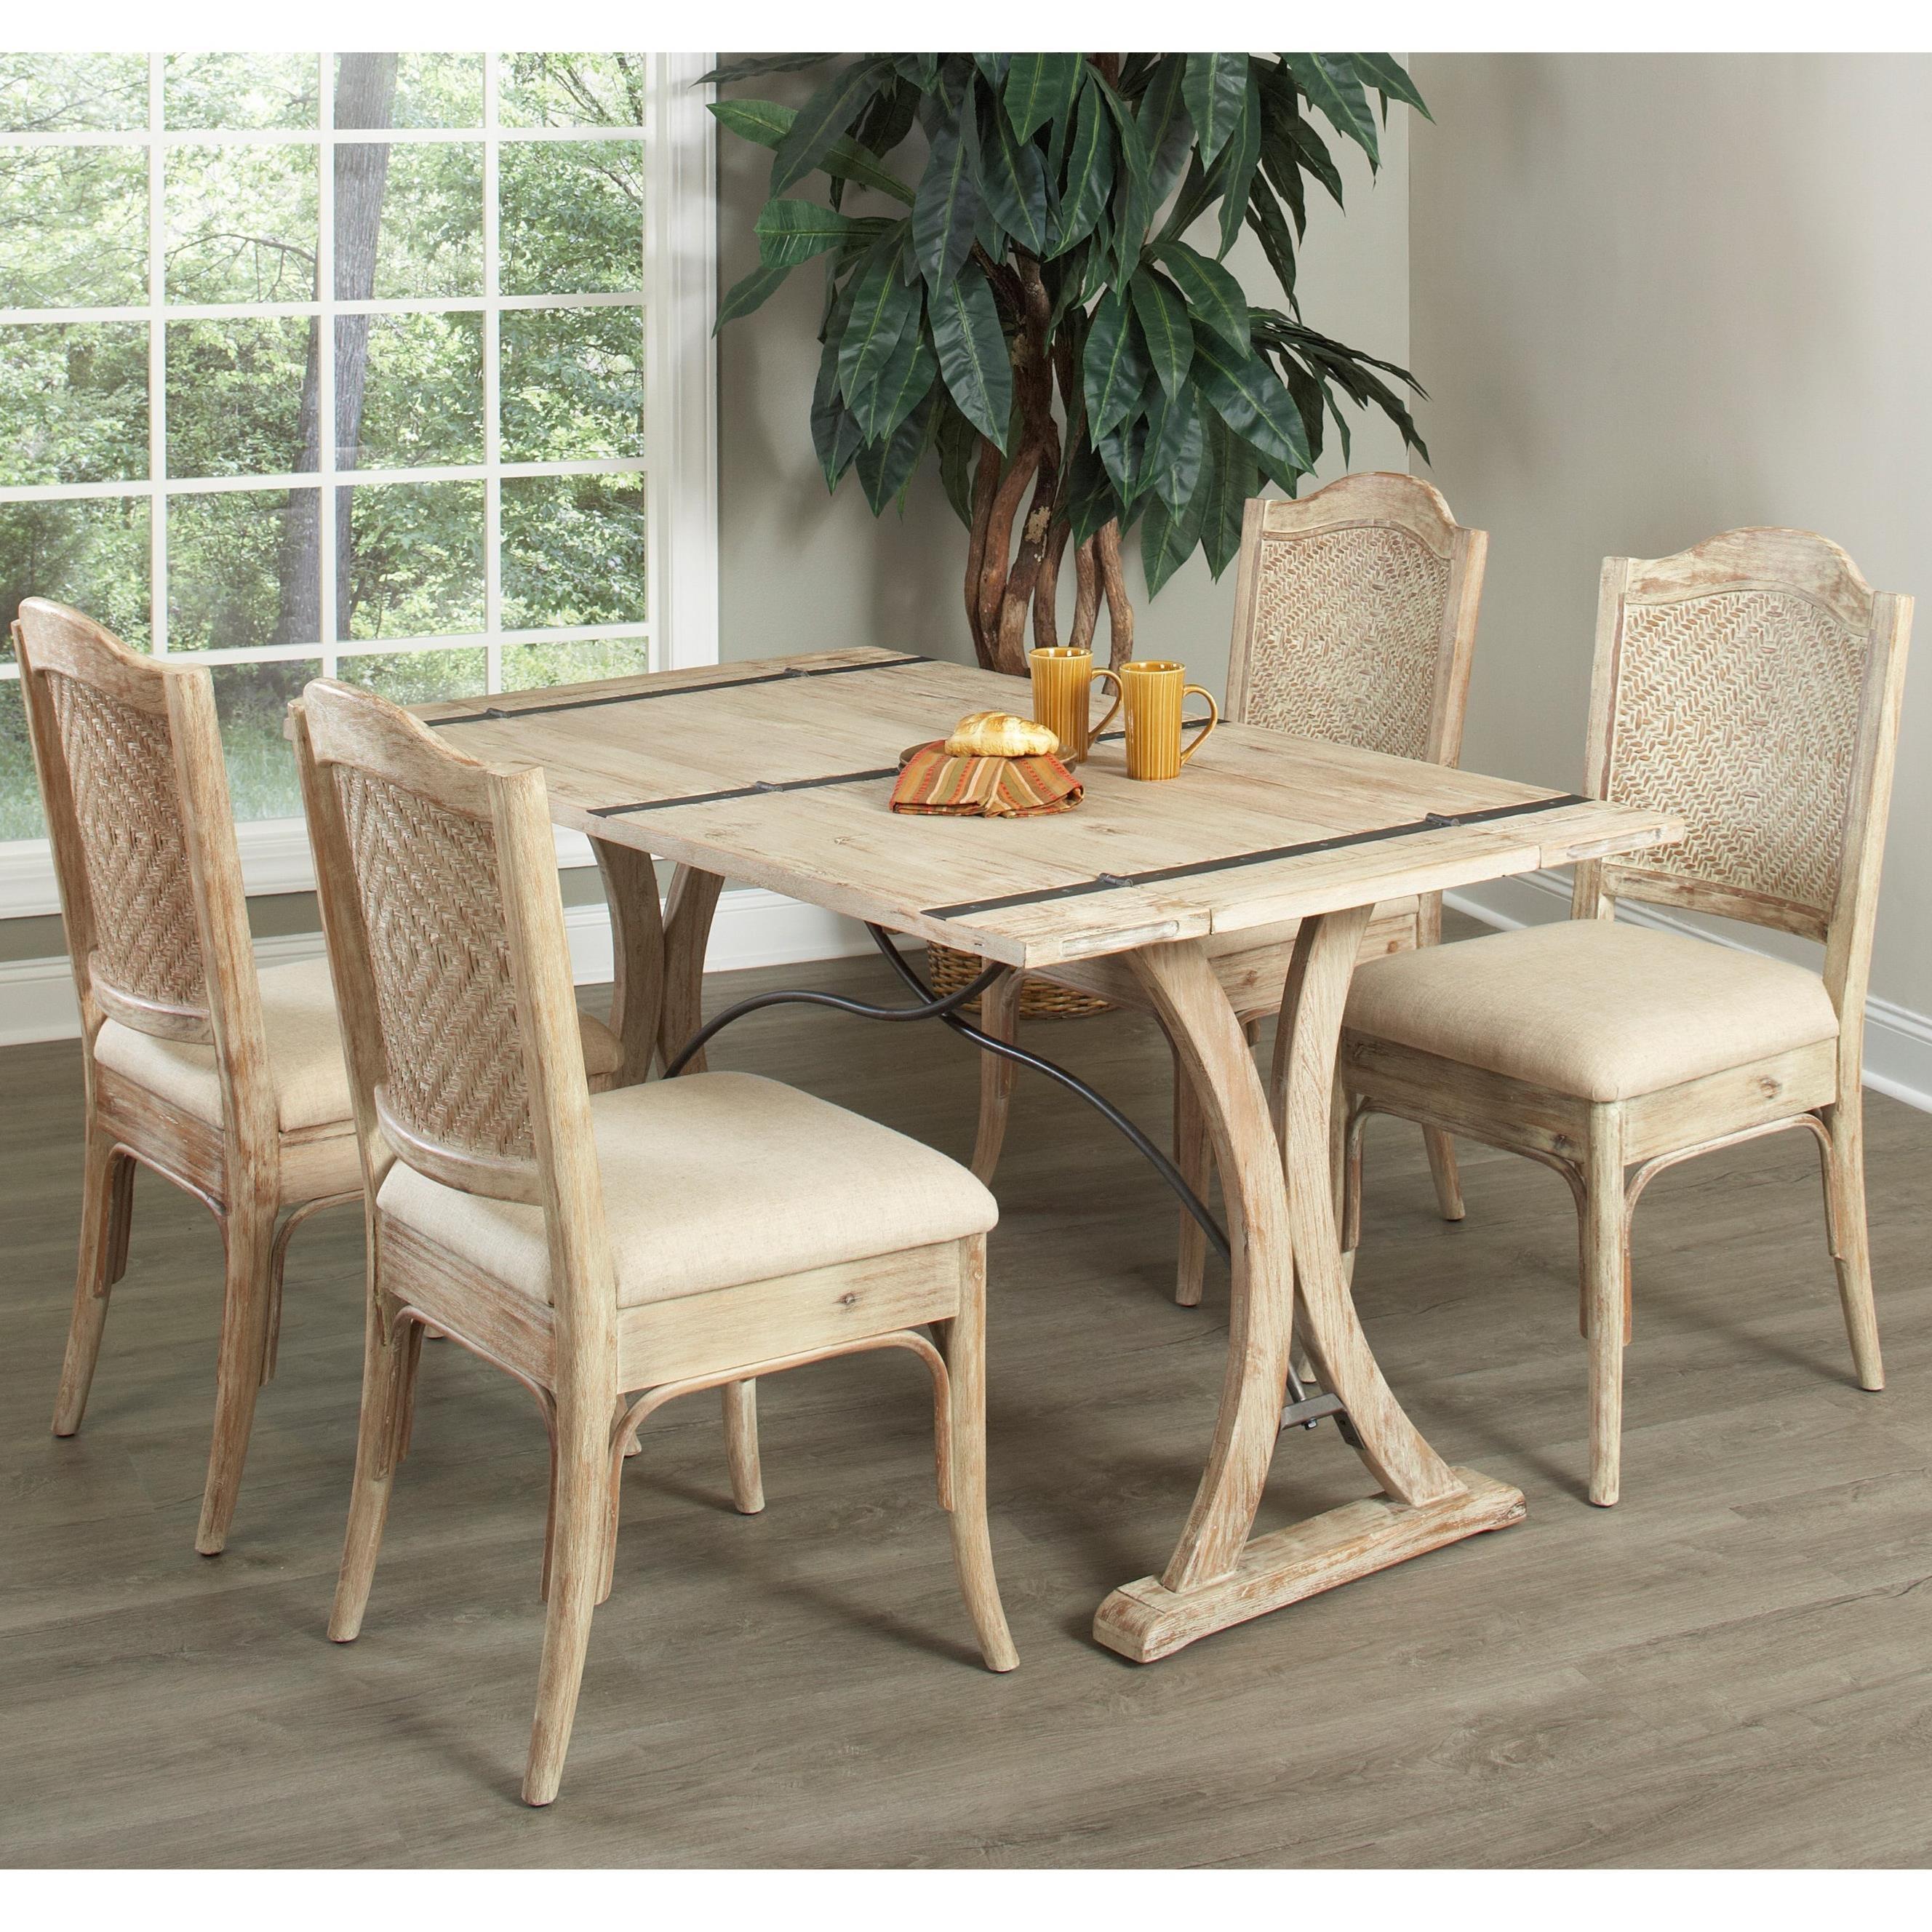 Largo Callista 5 Piece Dining Set With Folding Top Table